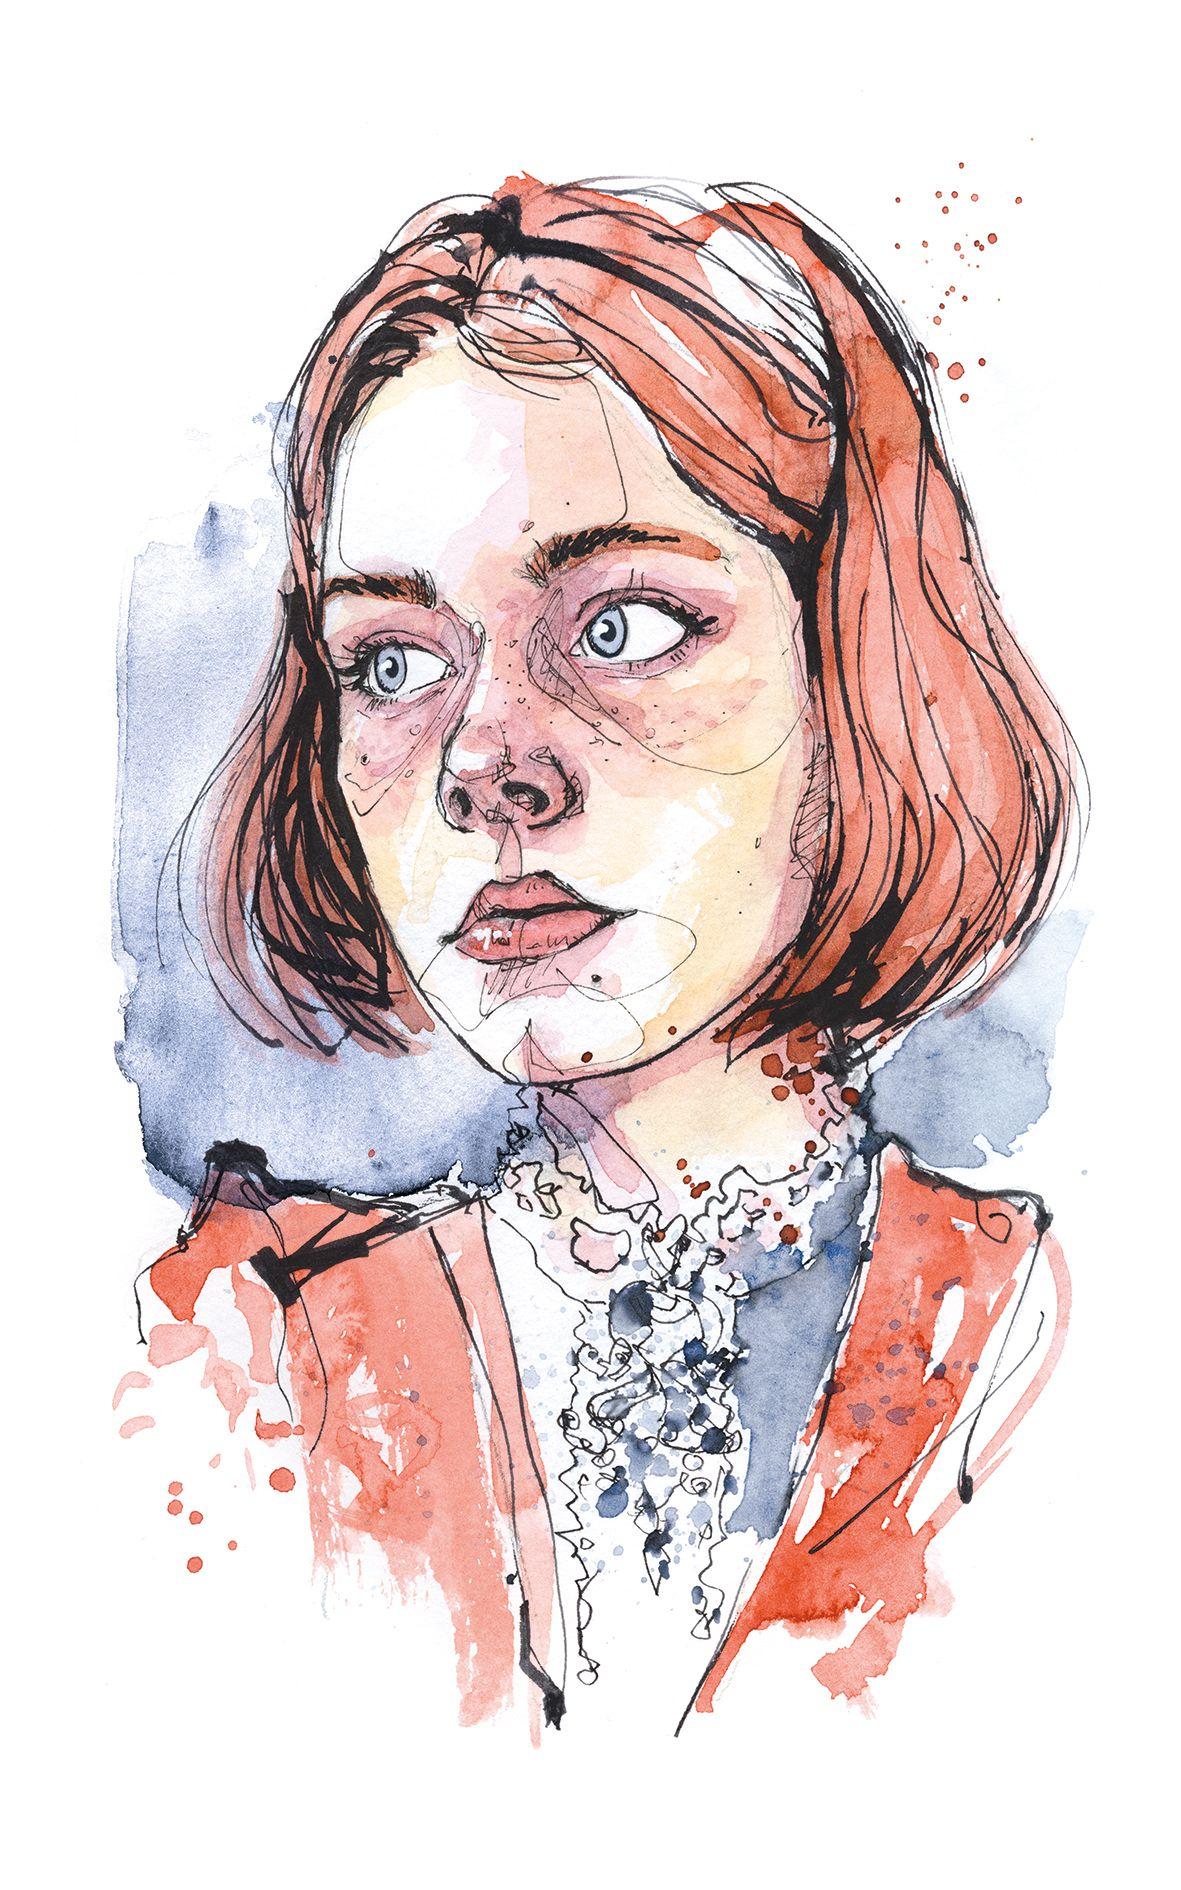 Line Art Watercolor : Dominic beyeler portrait portraitsketch sketch